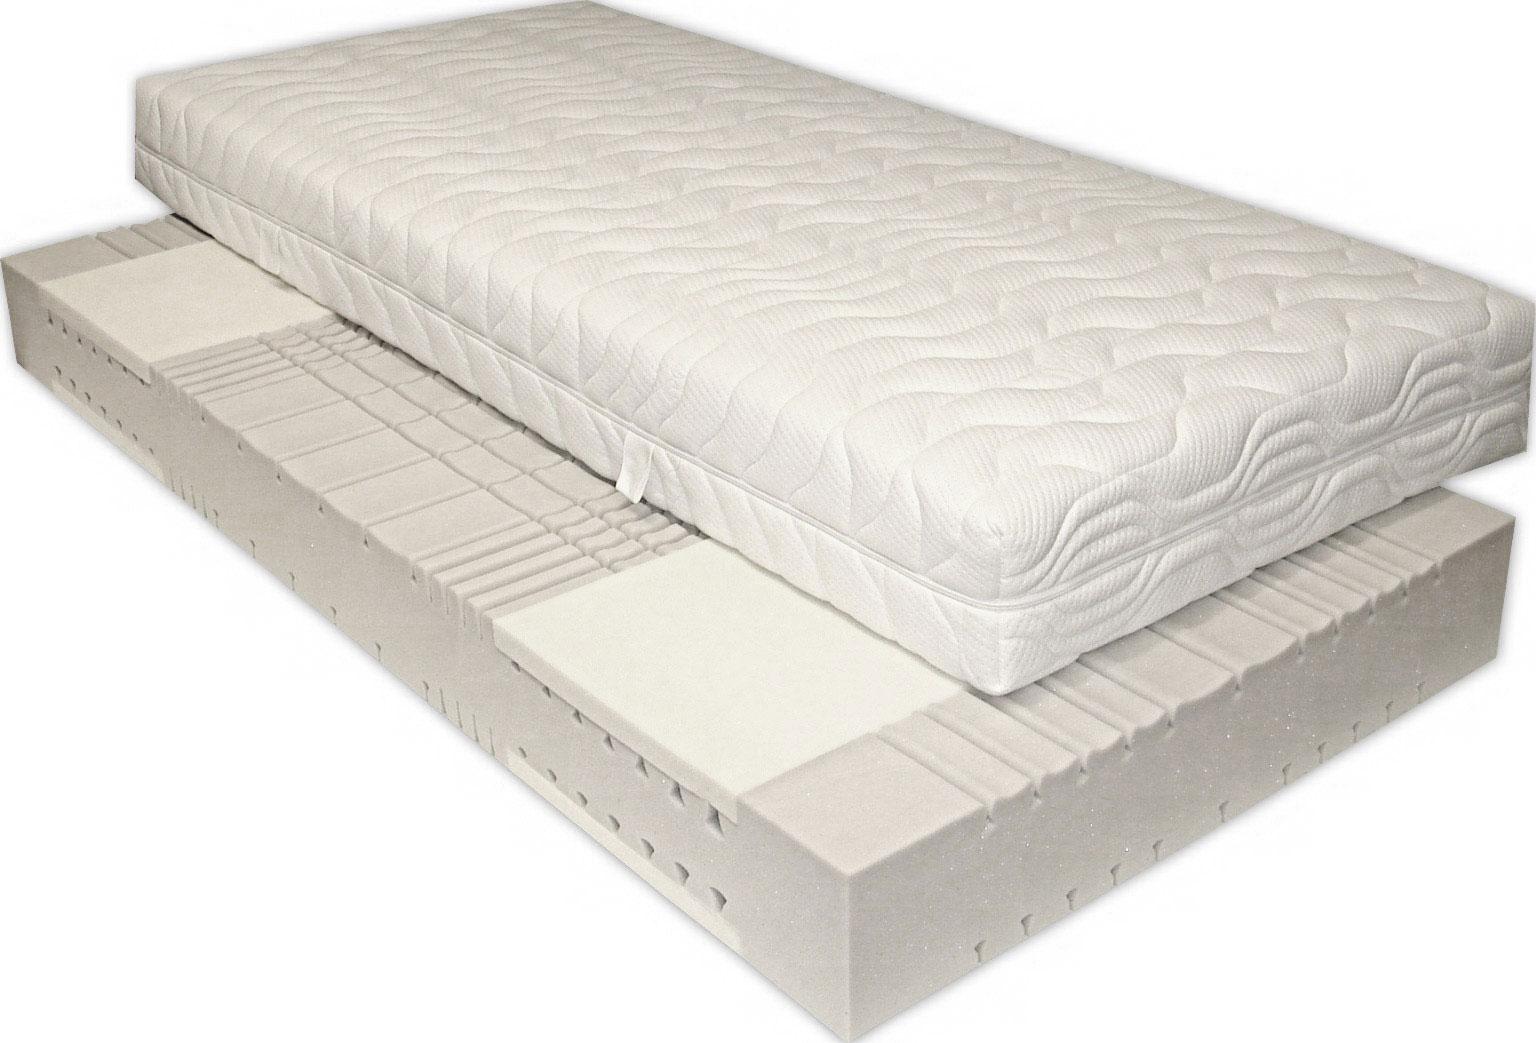 sam 7 zonen kaltschaum h3 visco matratze 80 x 200 cm passion. Black Bedroom Furniture Sets. Home Design Ideas